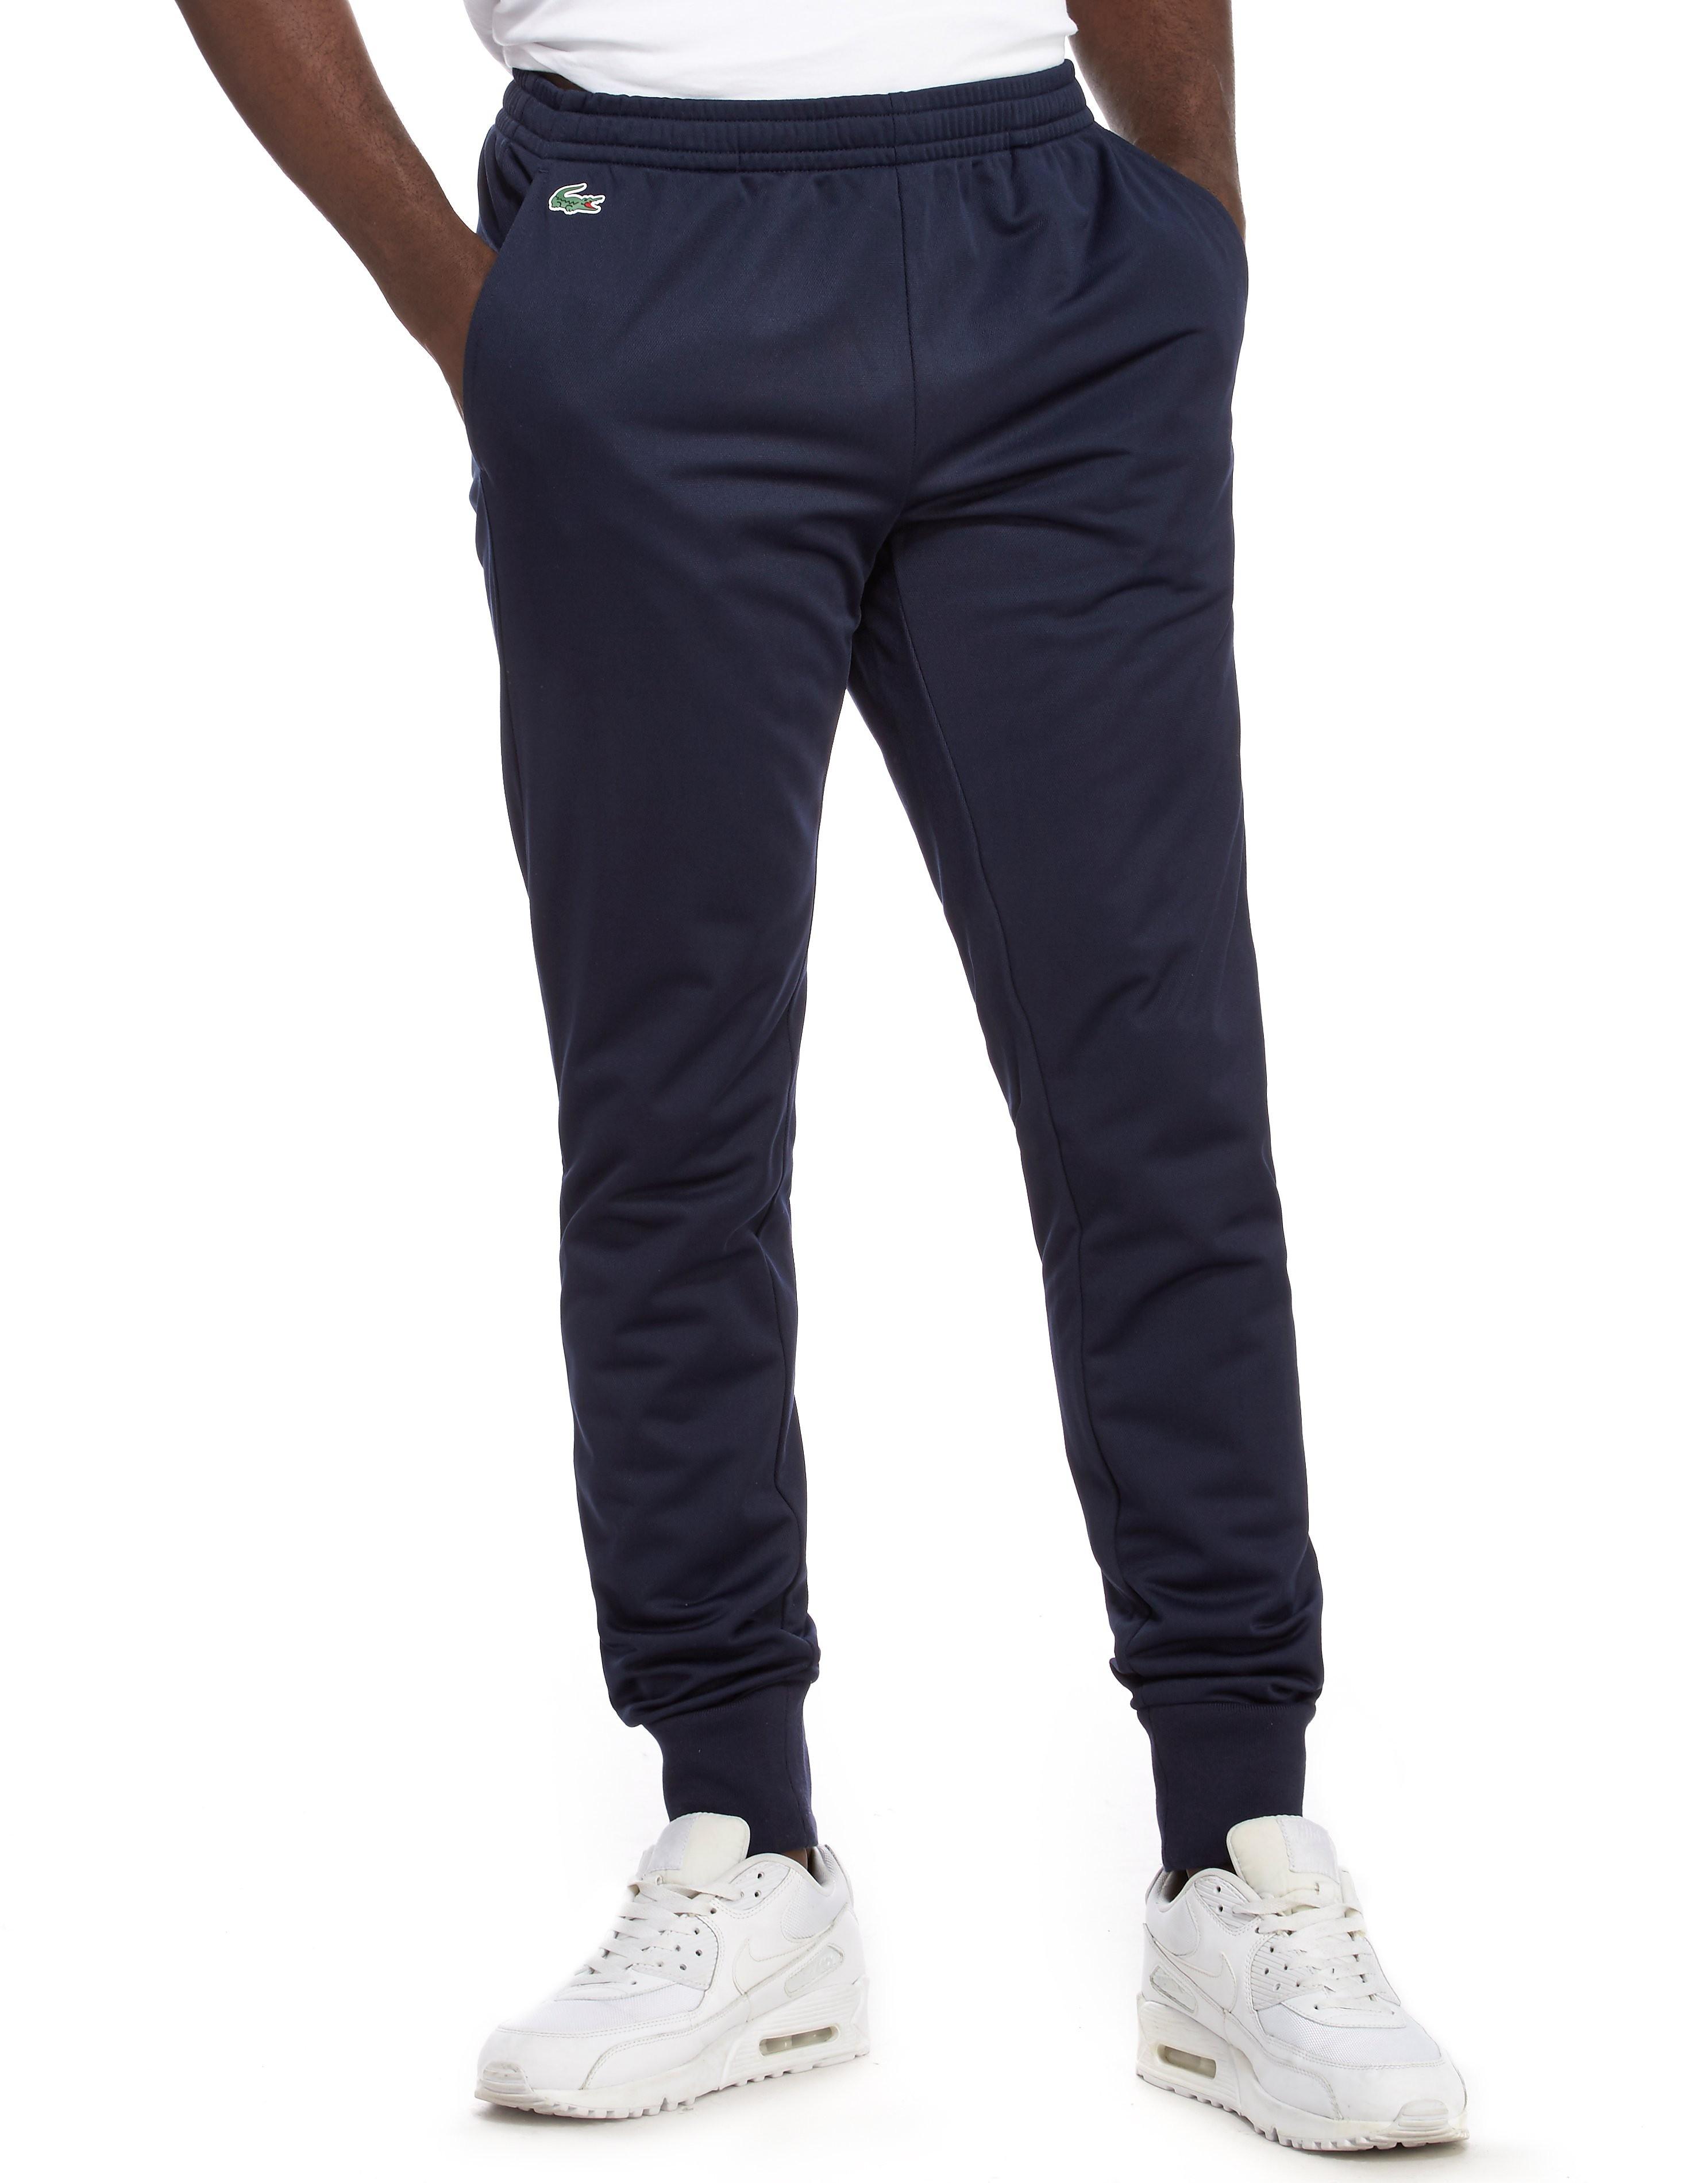 Lacoste Poly Pique Track Pants